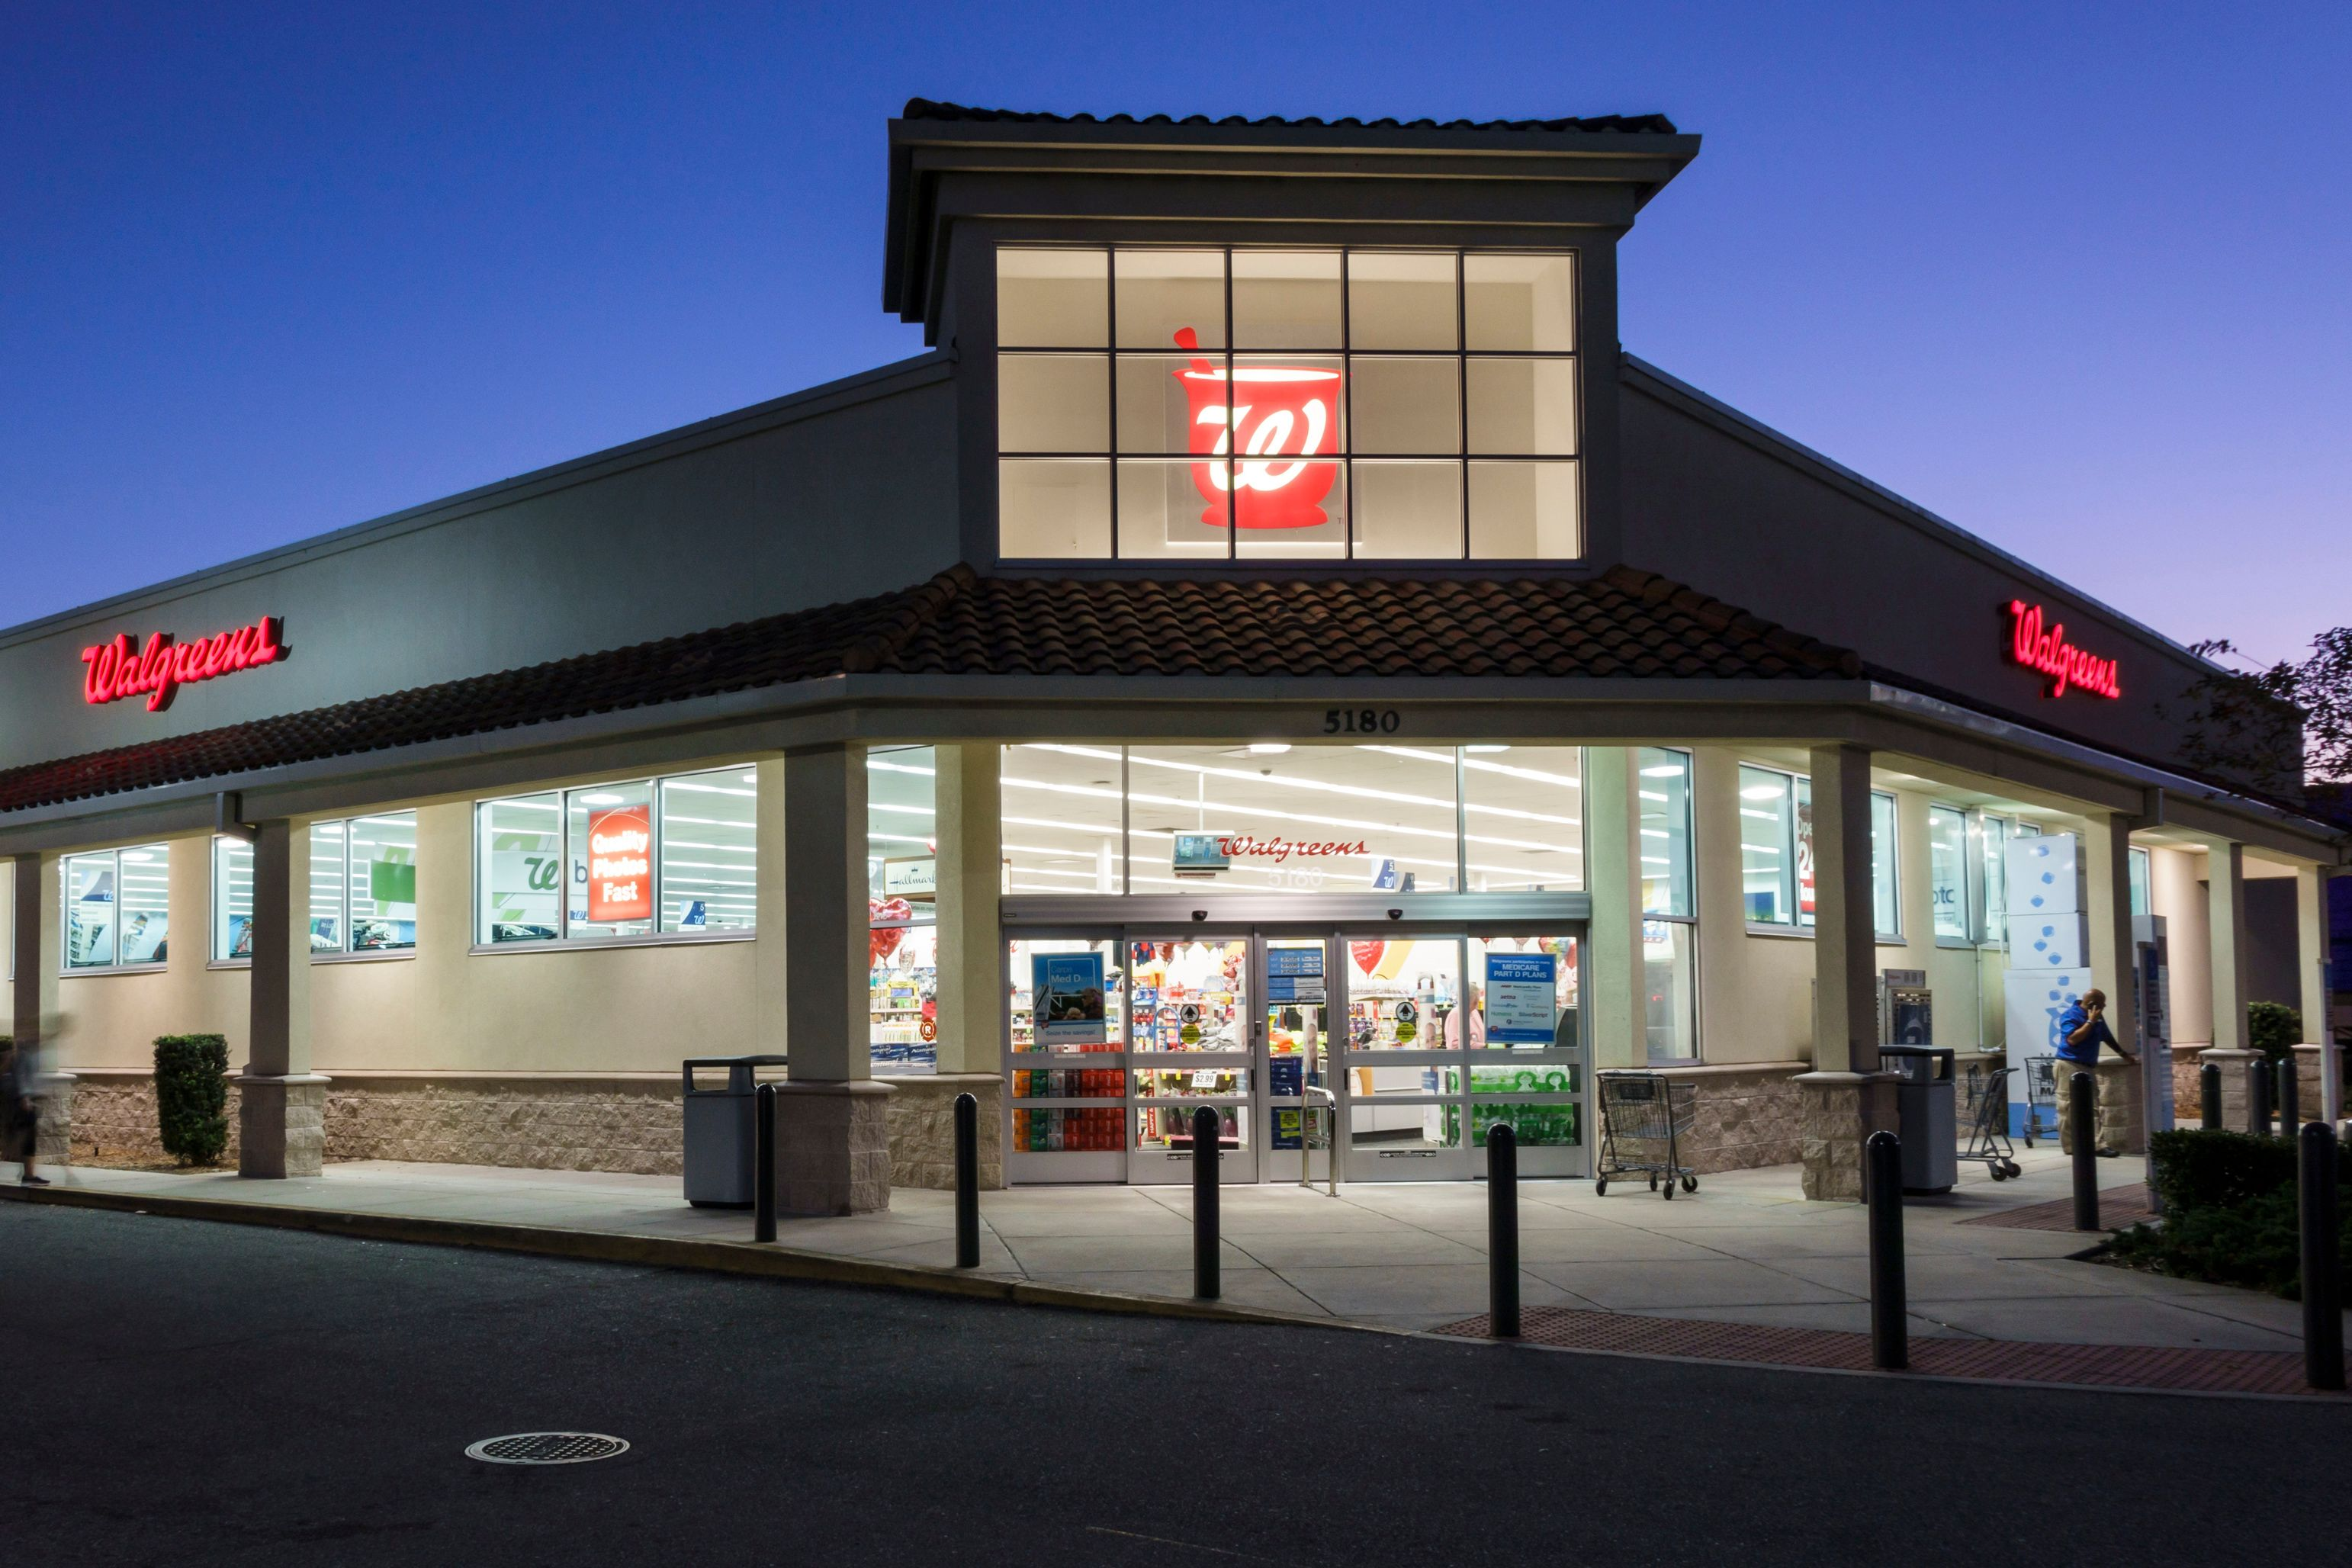 Walgreens to make bathrooms at all 8,100 stores